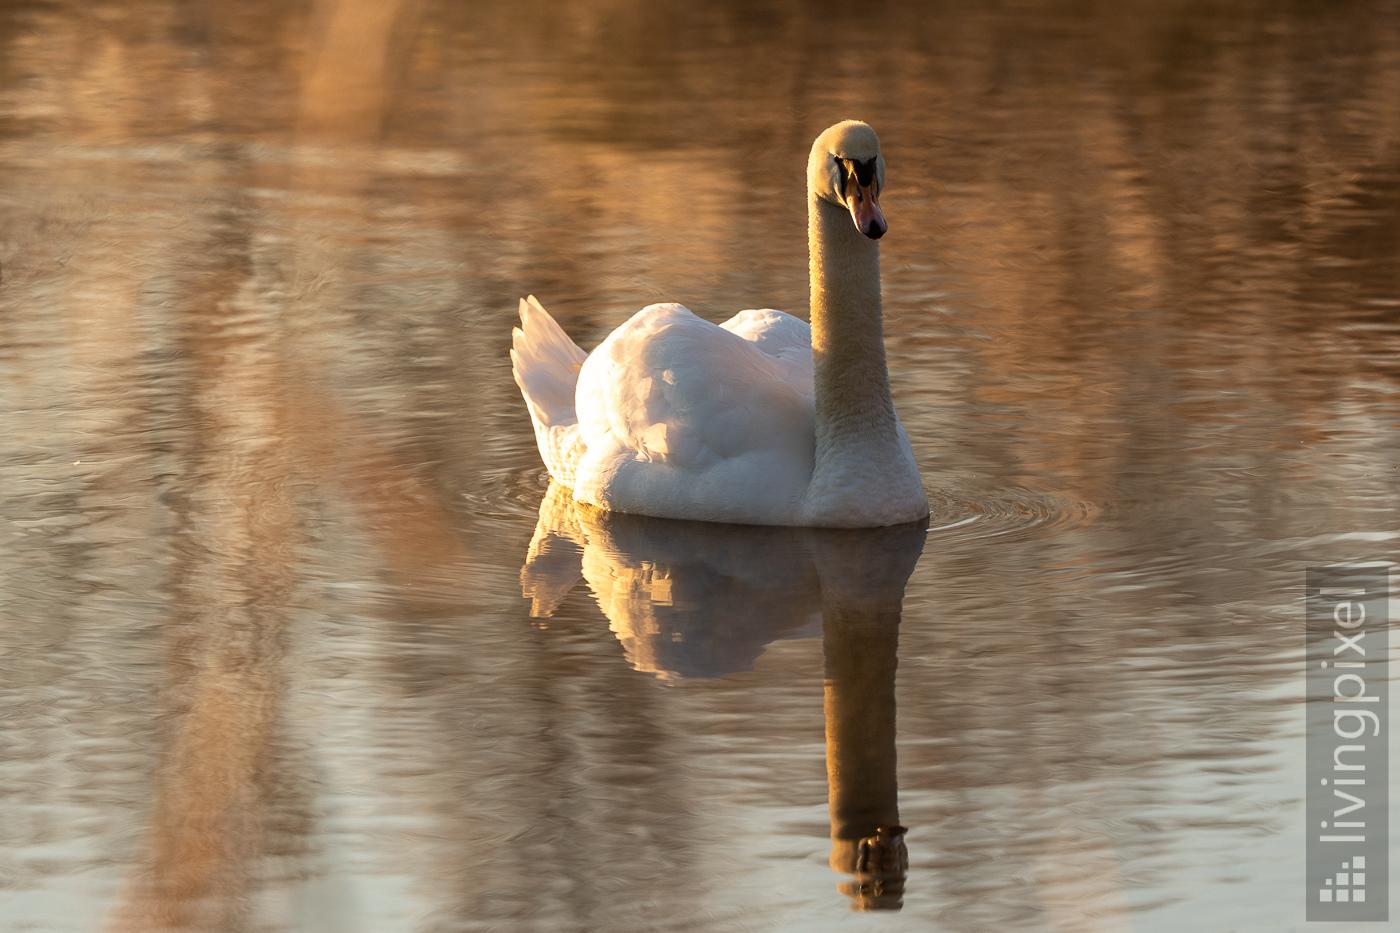 Höckerschwan (Mute swan)